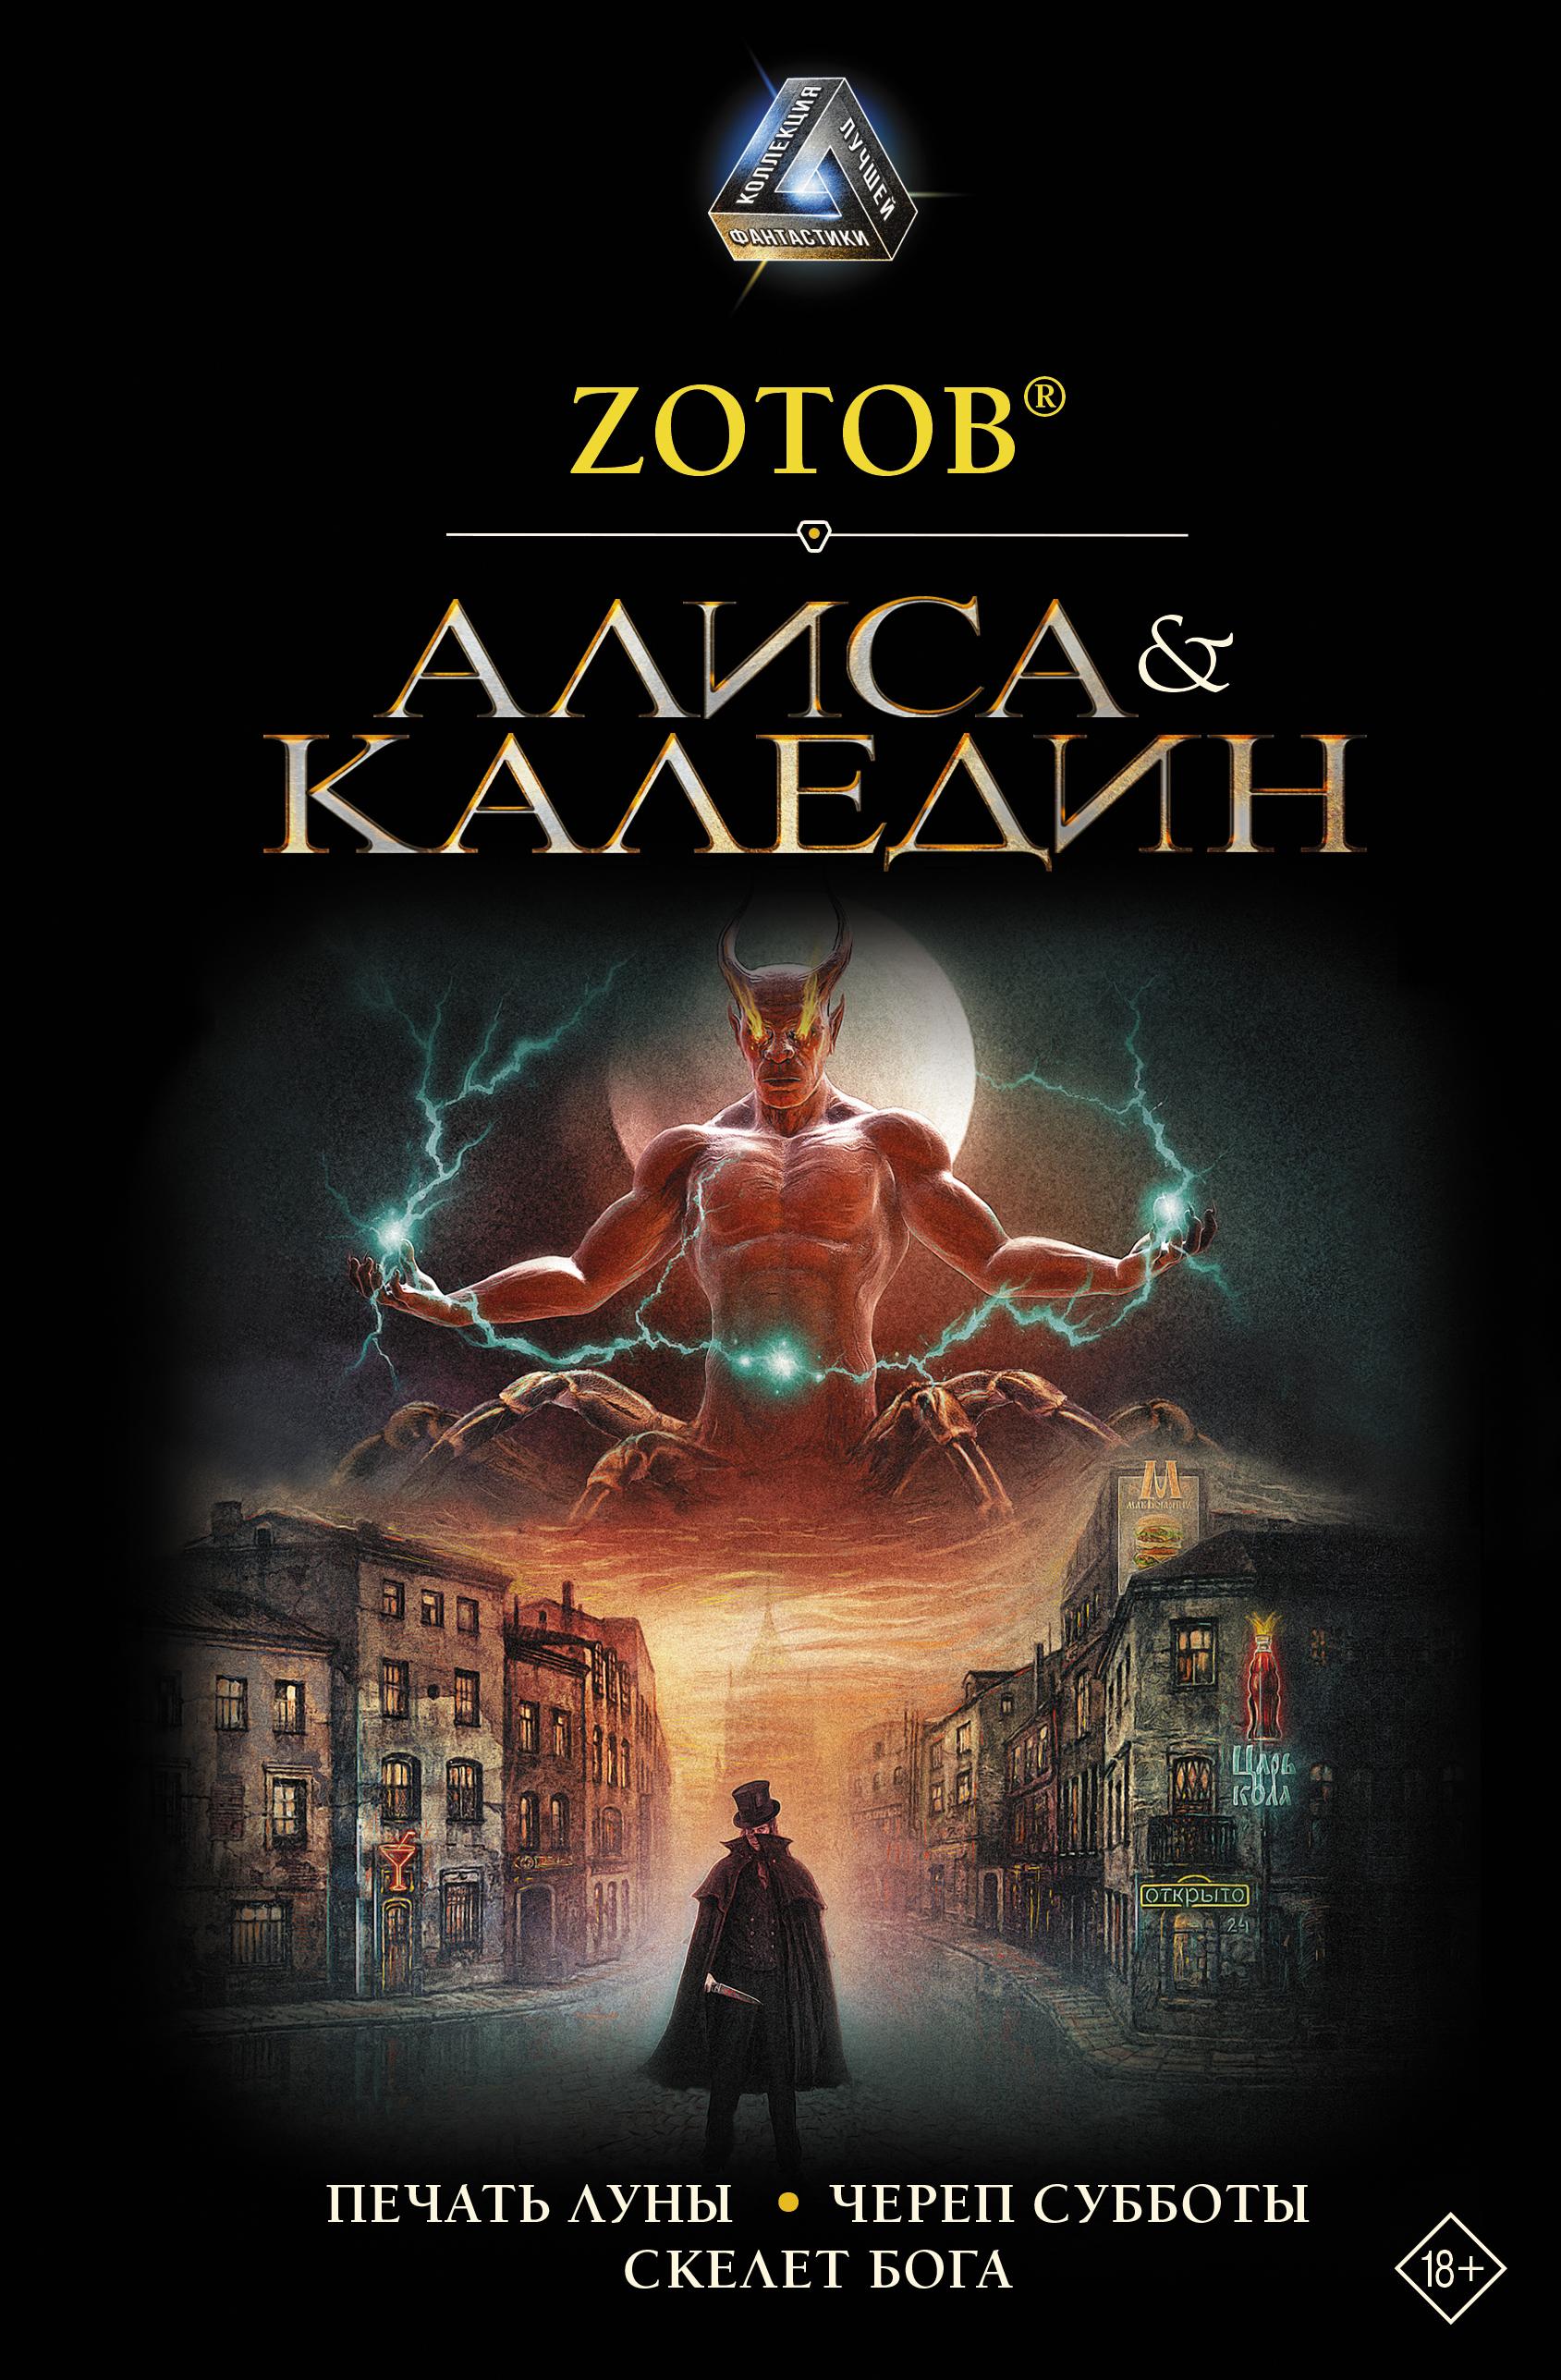 Зотов (Zотов) Г. А. Алиса & Каледин